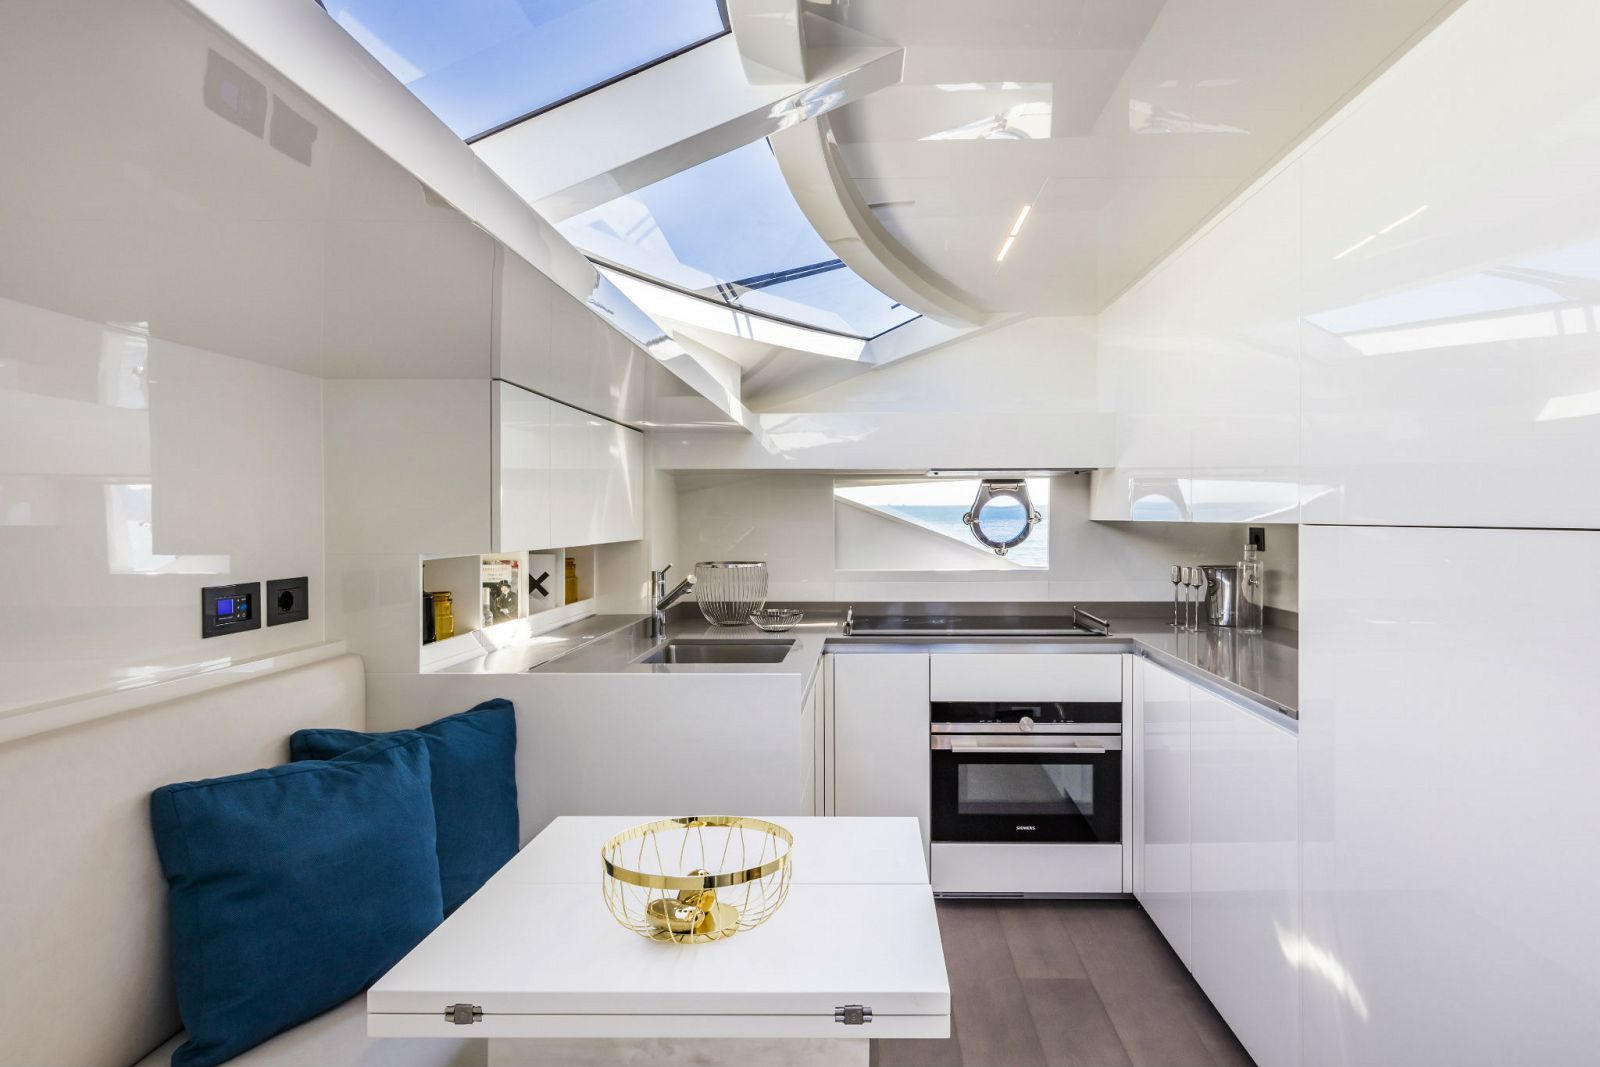 Ferretti Yachts 850 Galley - New Luxury Yacht for Sale >